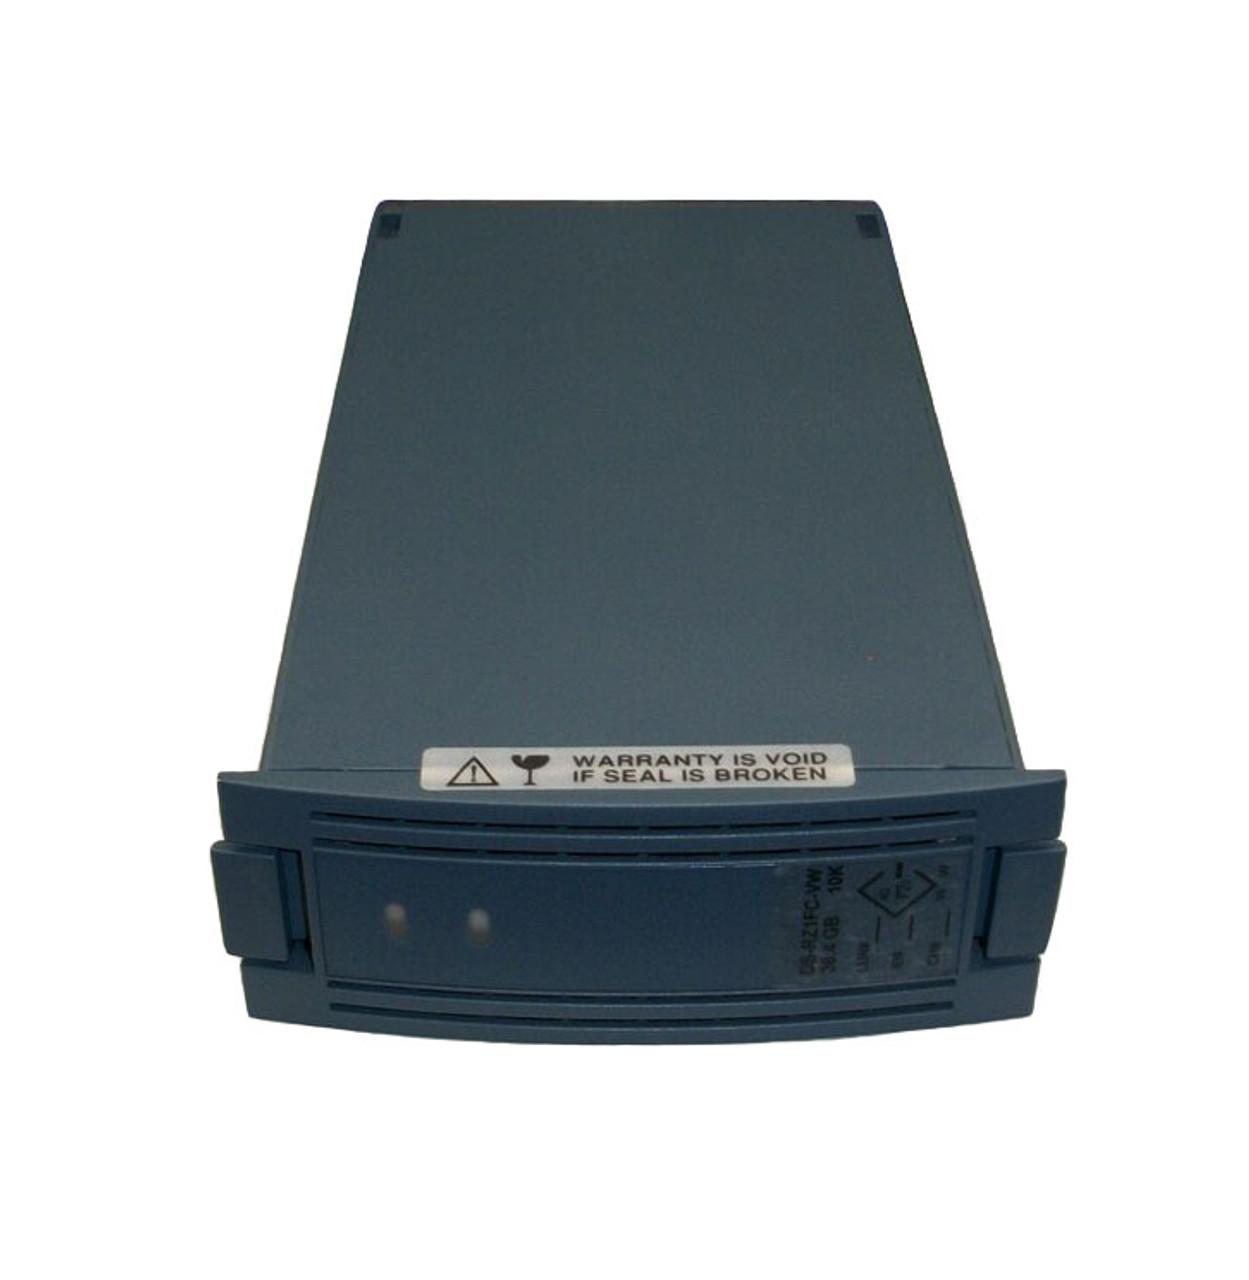 Compaq DS-RZ1FC-VW